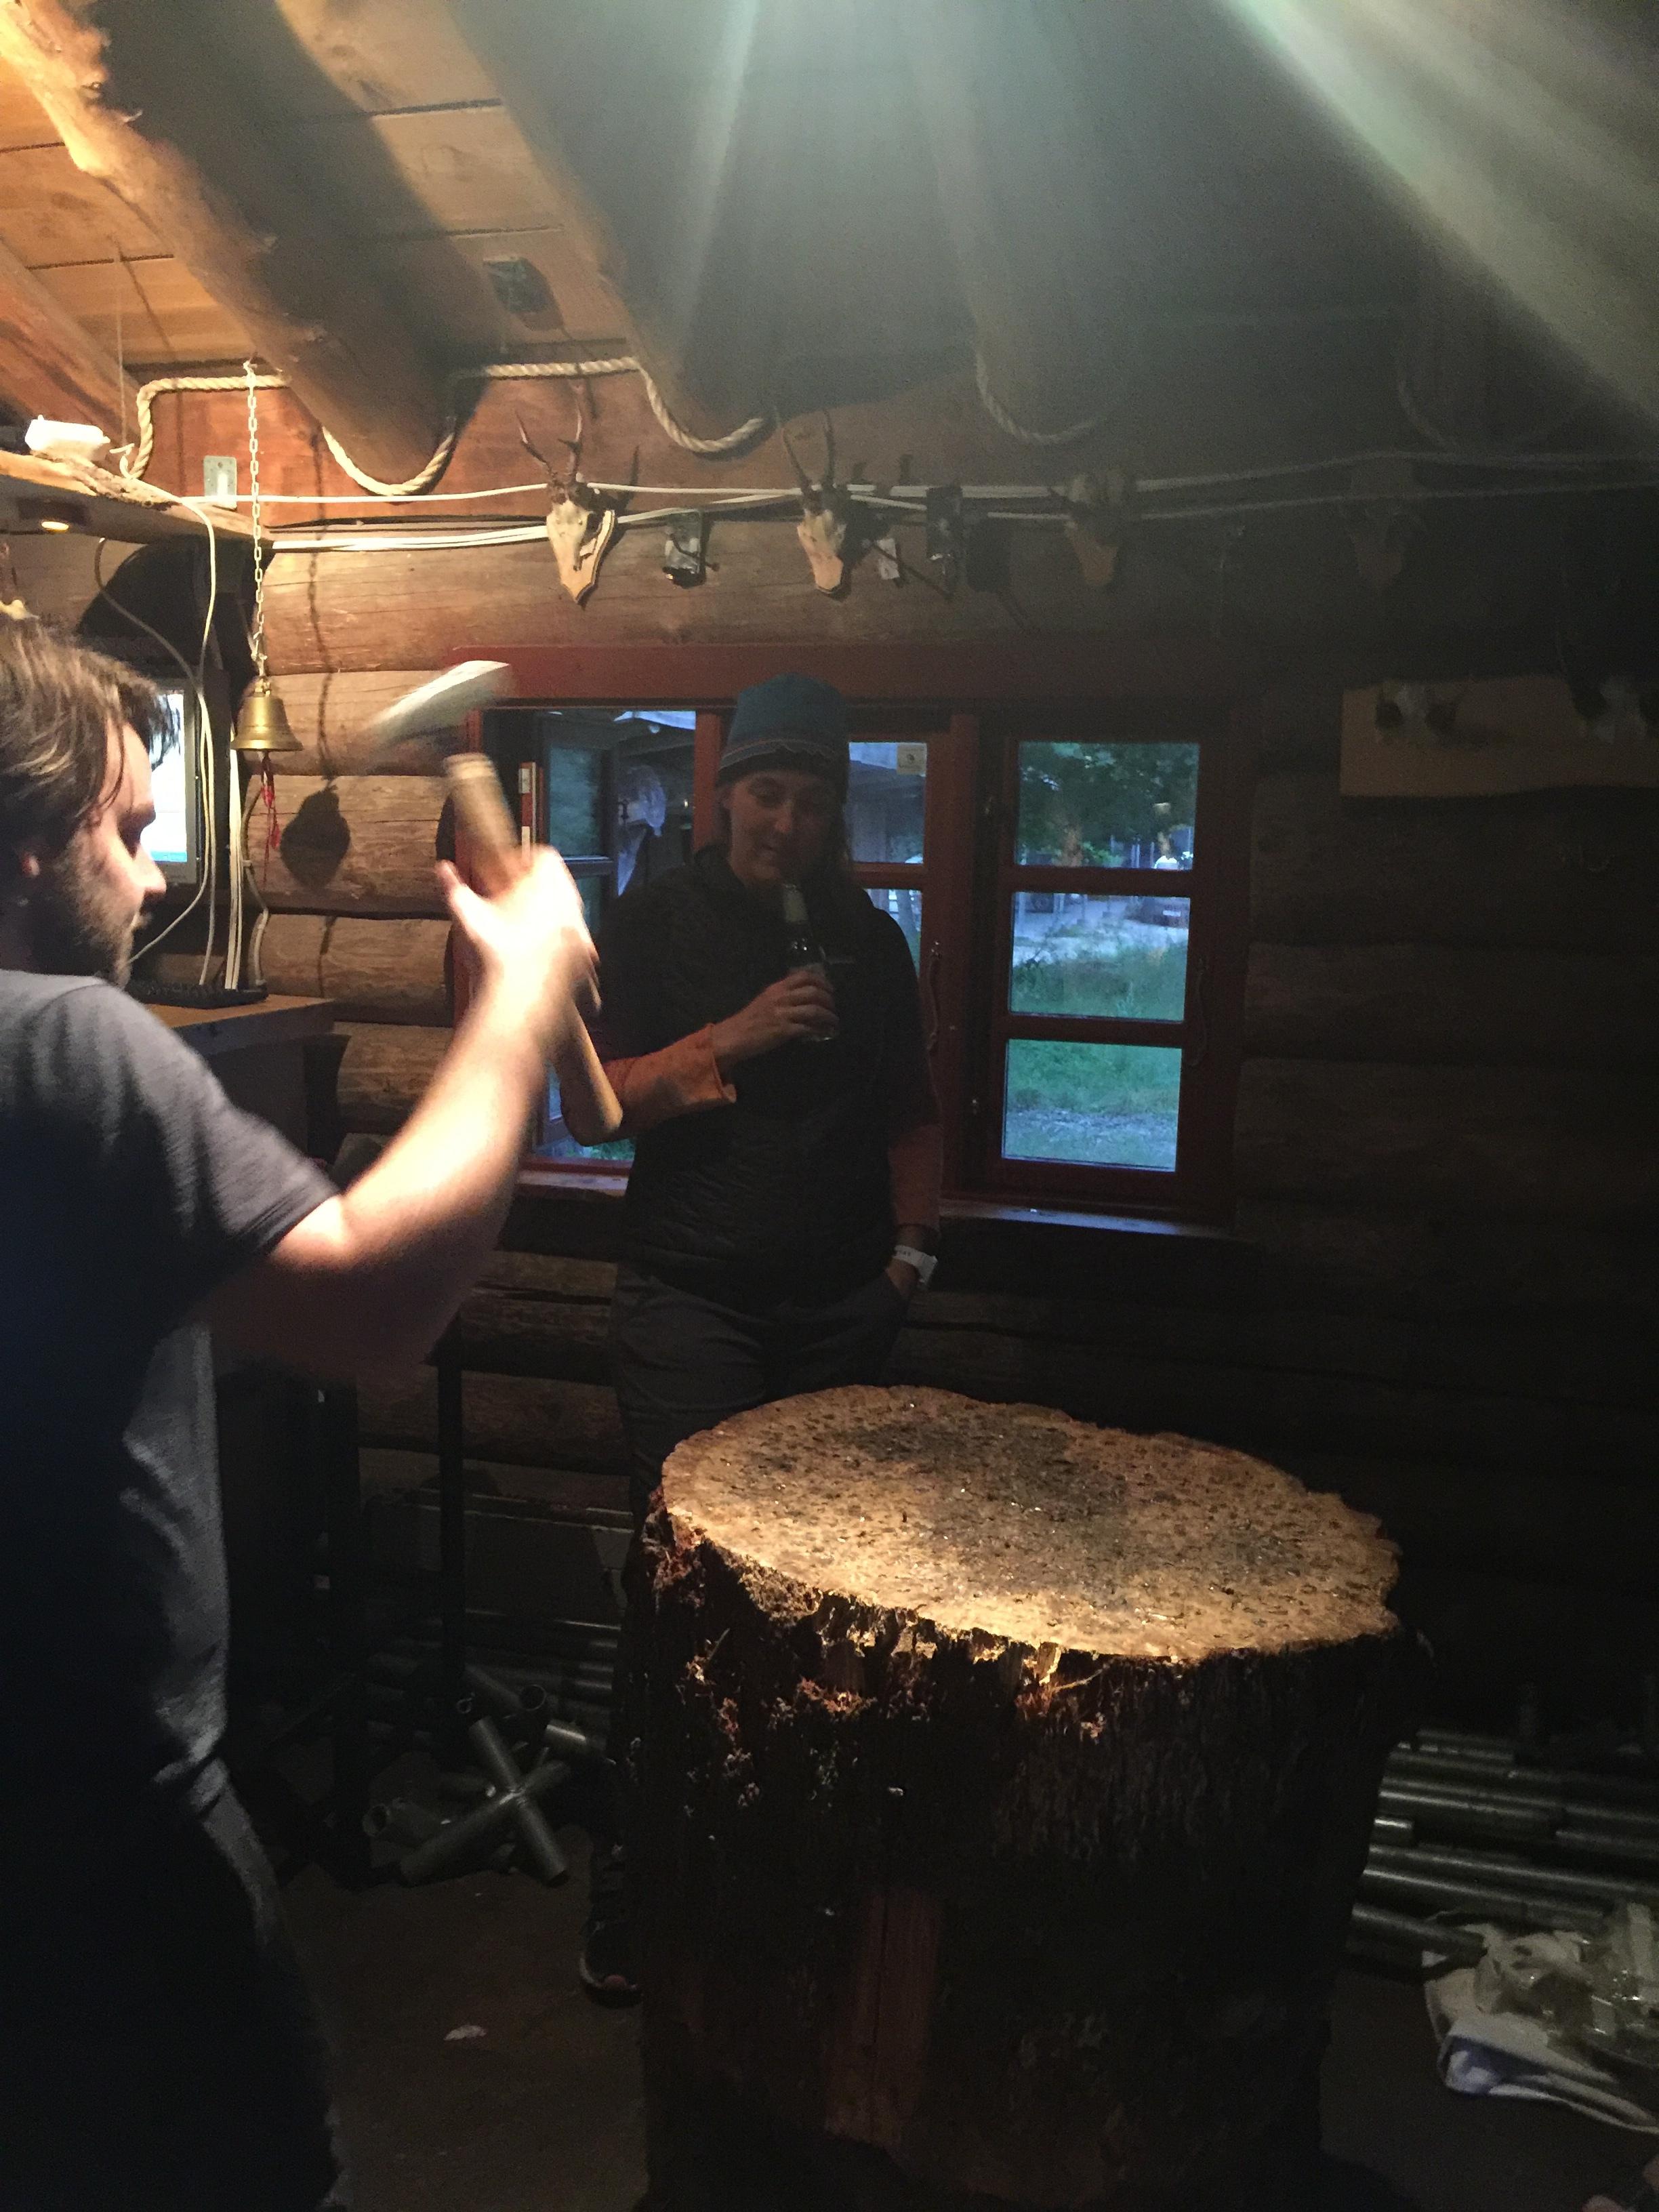 Asbjørn playing the Nail Game